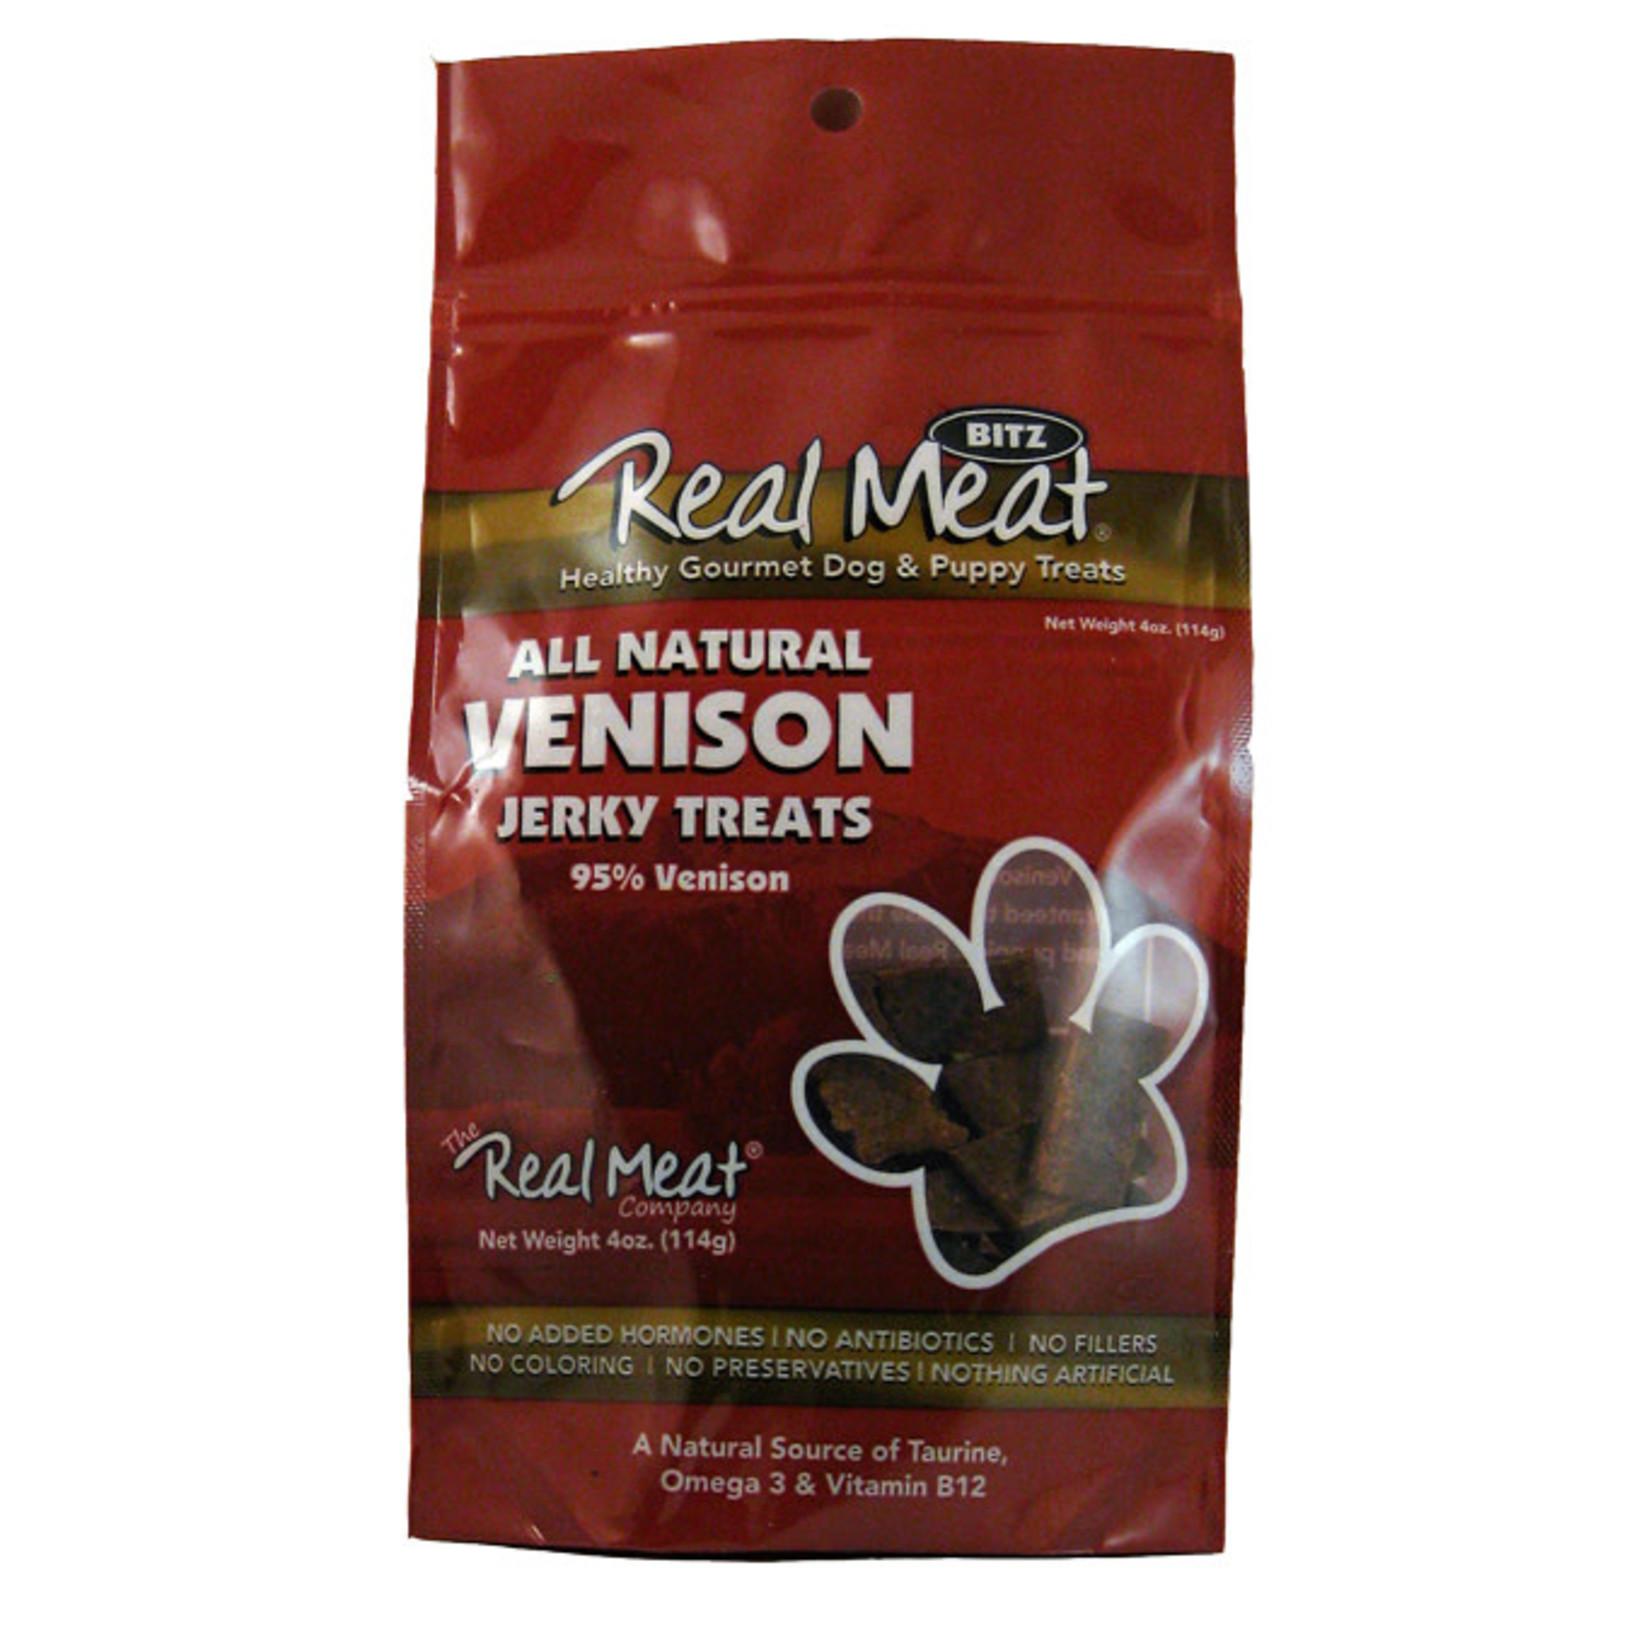 Real Meat Real Meat Venison Jerky Dog Treats 4oz